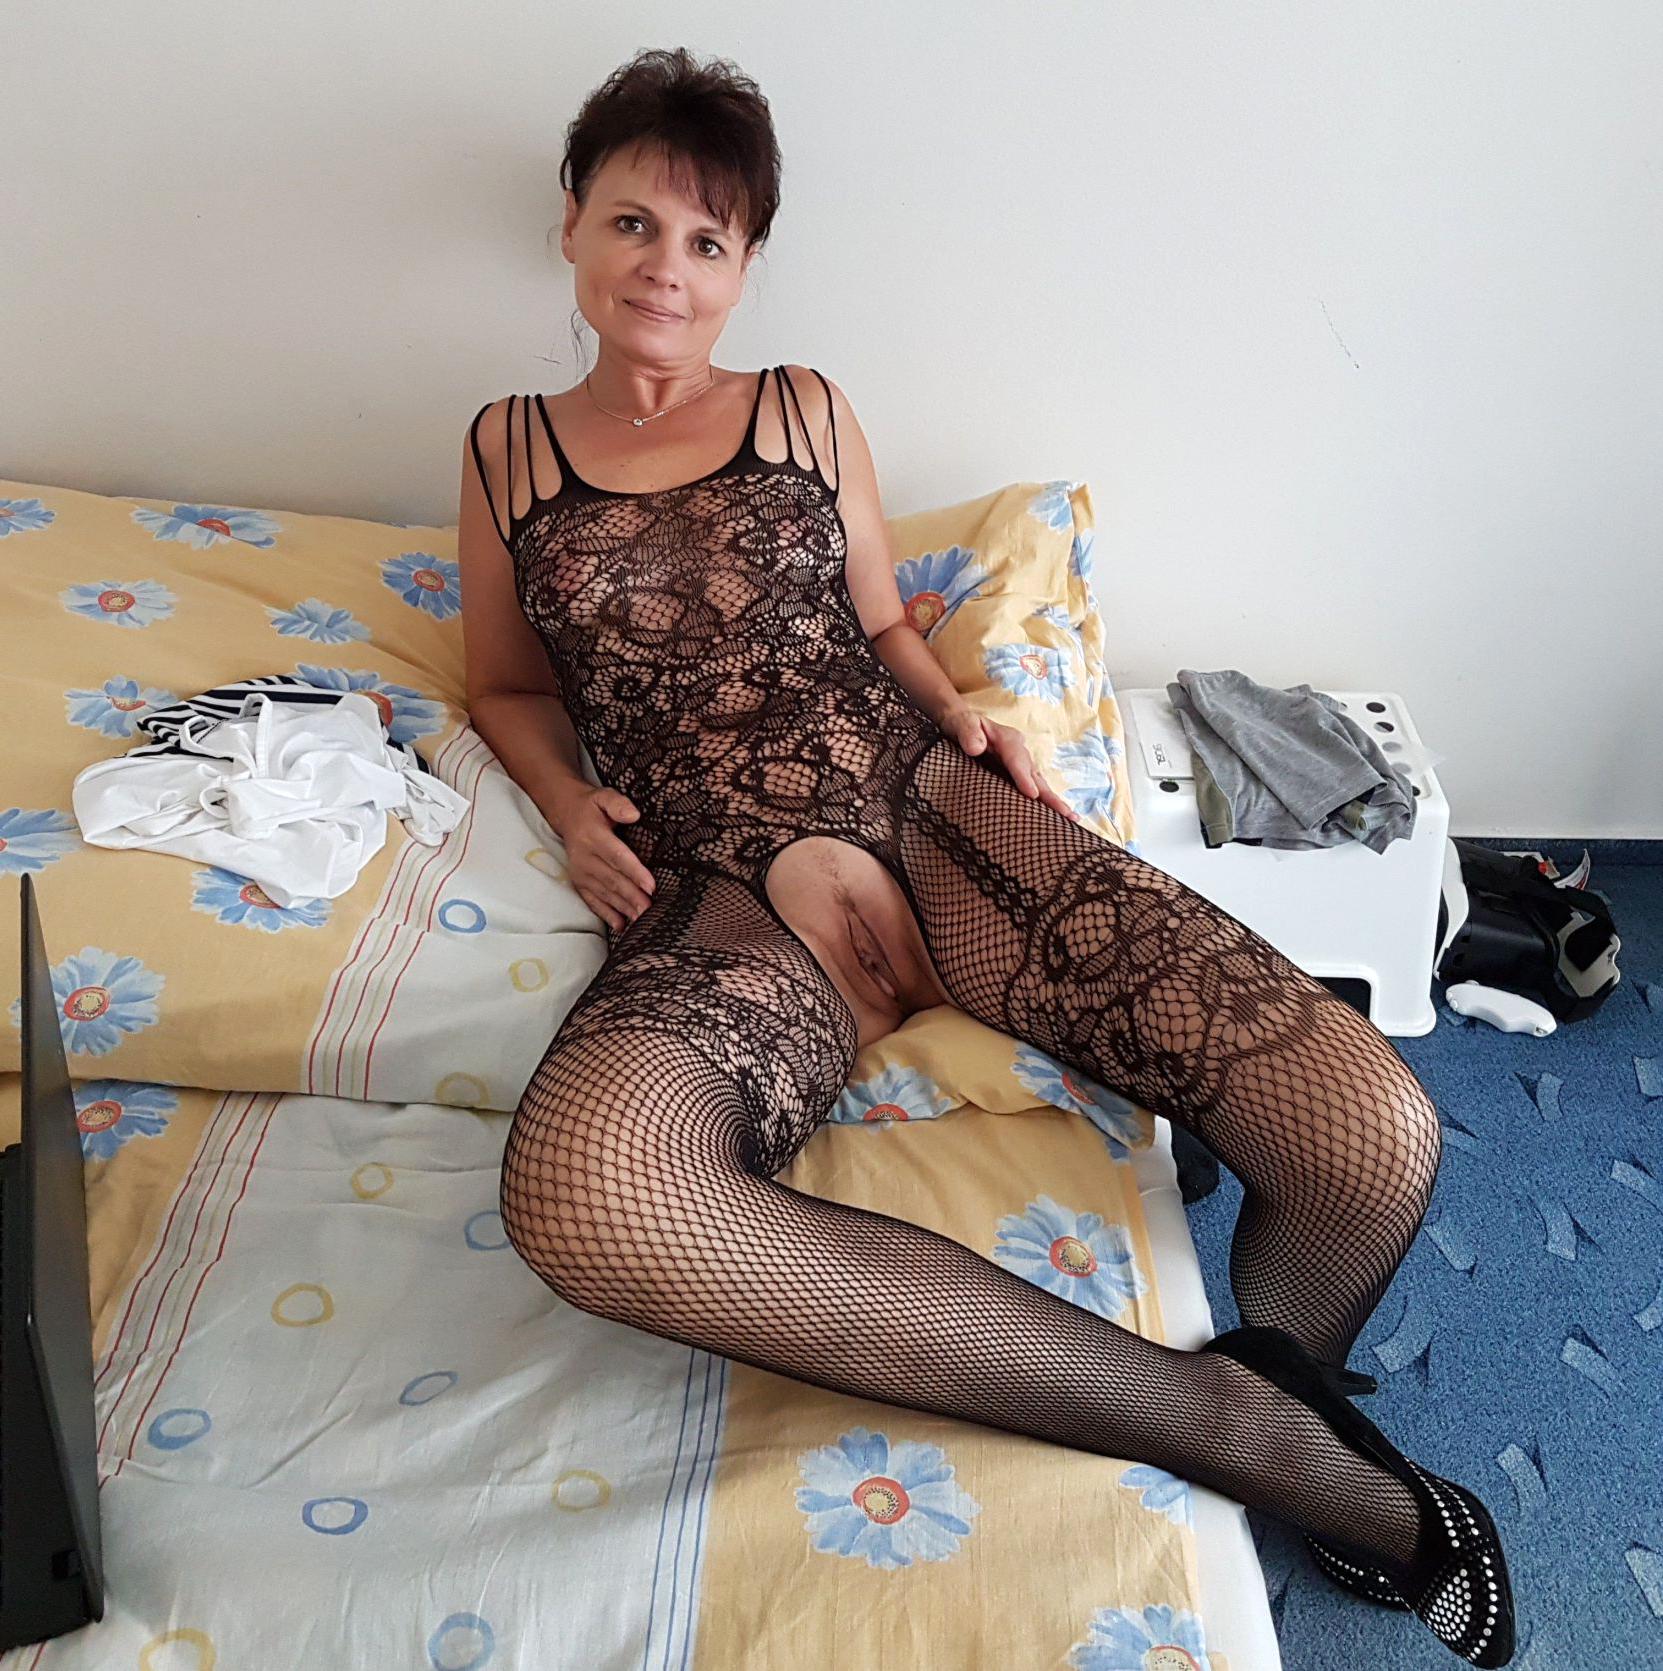 Mature ladies in pantyhose pics